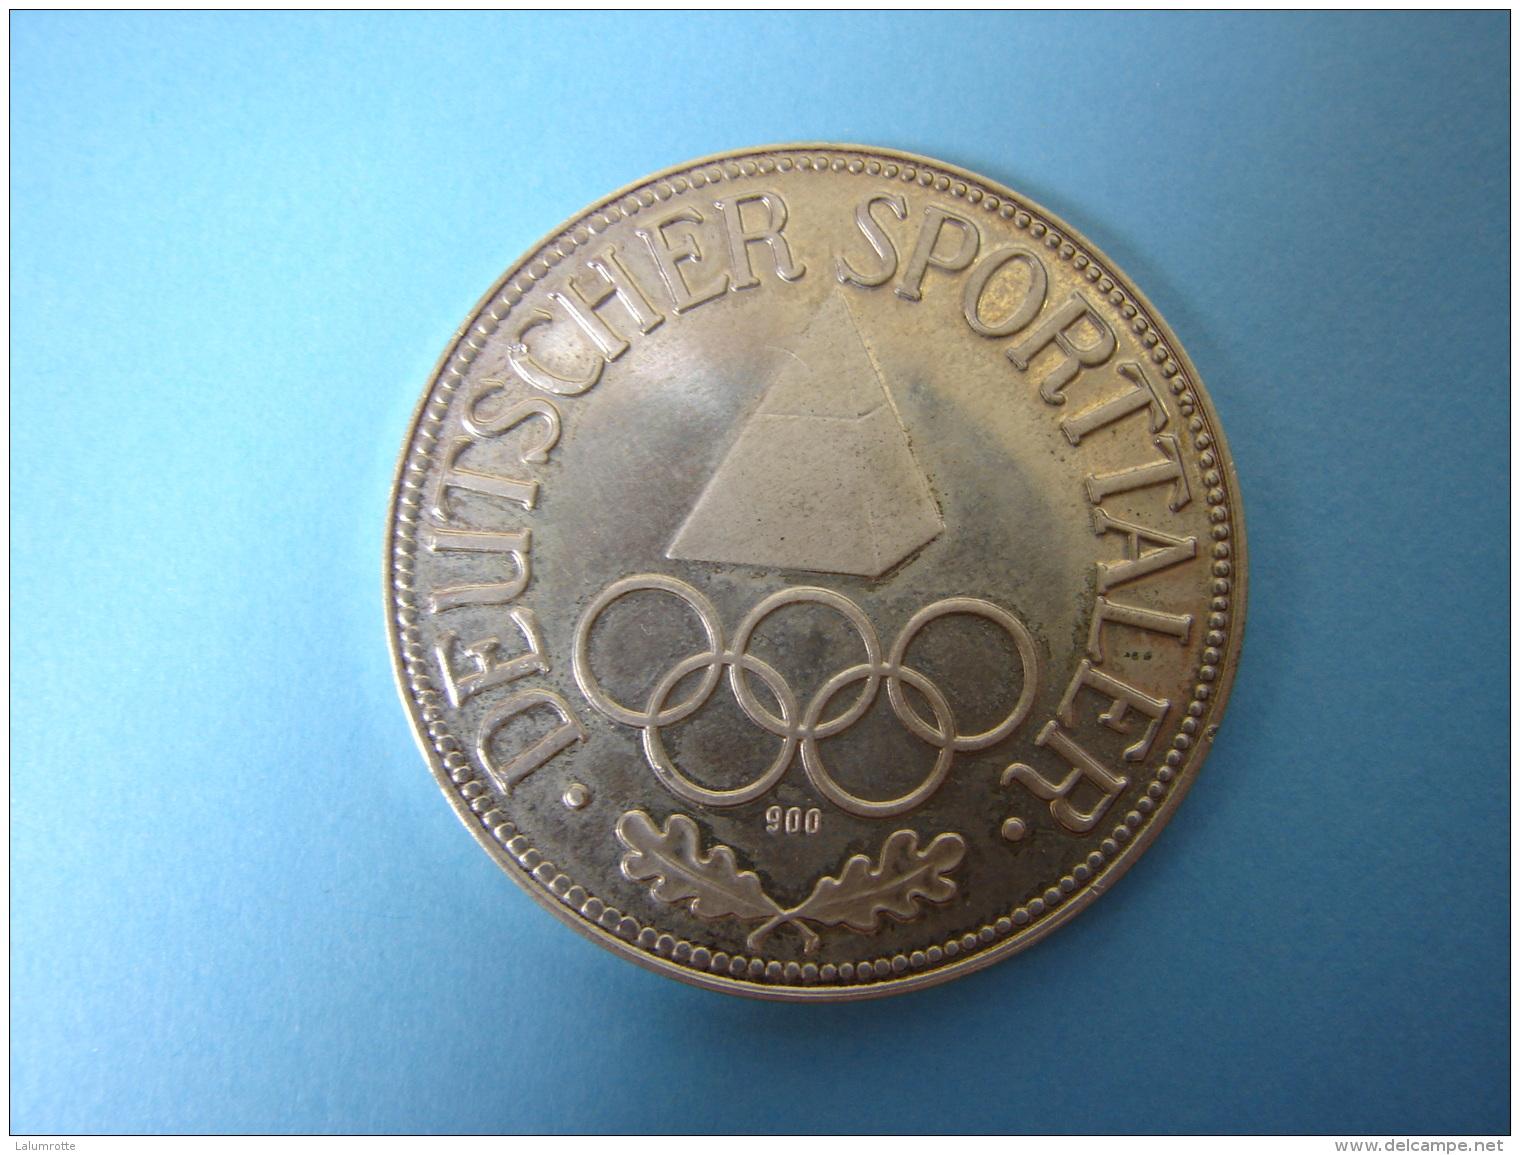 PA. Mo. 69. Jugend Der Welt IM Sport Vereint . Deutscher Sportaler. Argent 900 - Germany